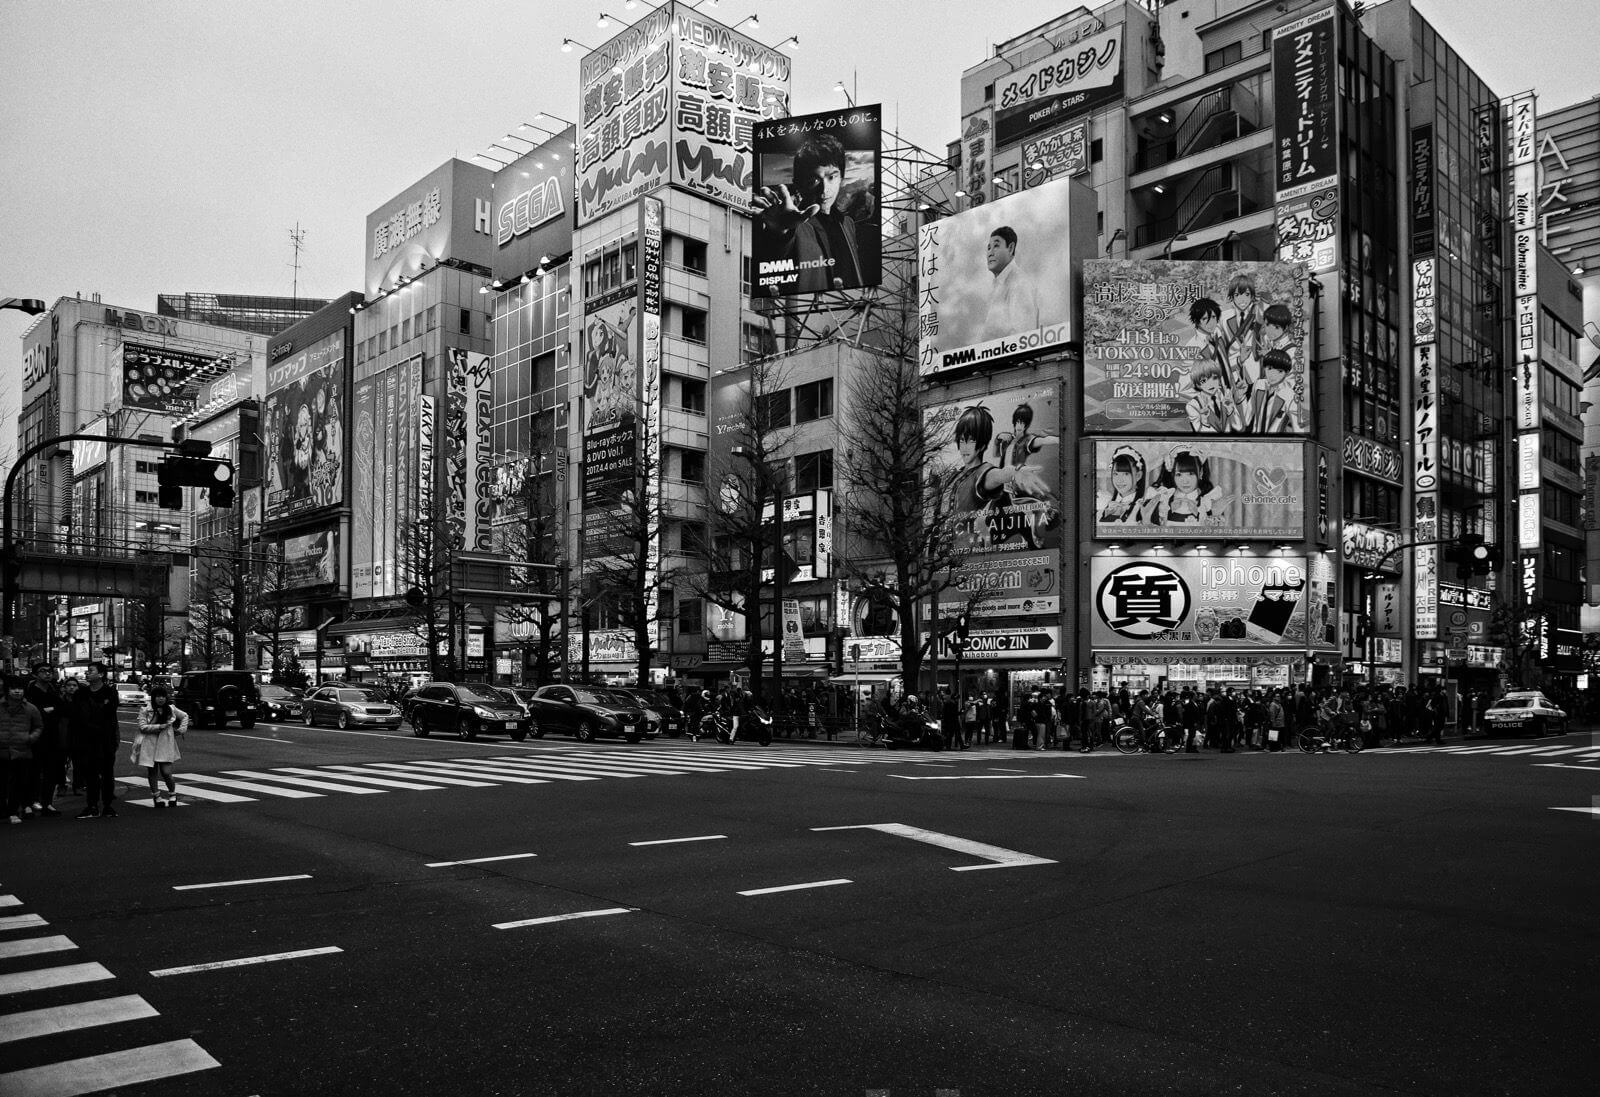 Busy street at Akihabara, Tokyo - Photo by Zdenek Sindelar of CuriousZed Photography